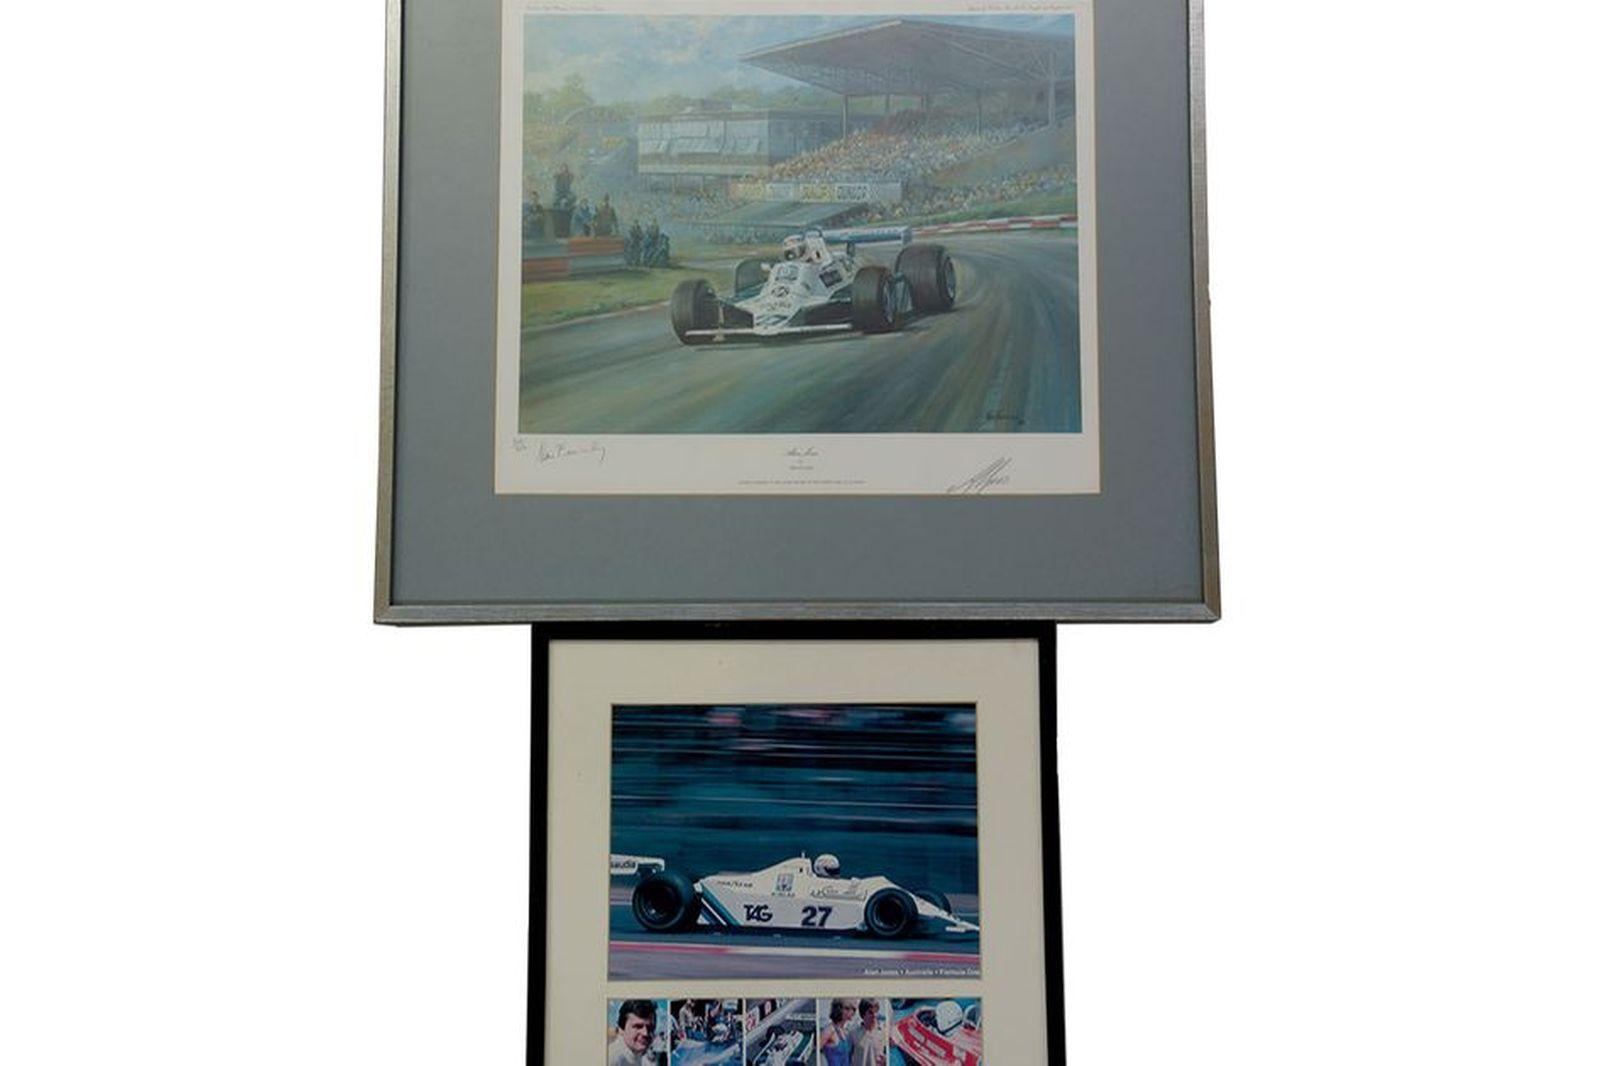 Framed Signed Print - 'Alan Jones in Formula 1 Race Car' signed by Artist & Driver (No: 302 of 850)